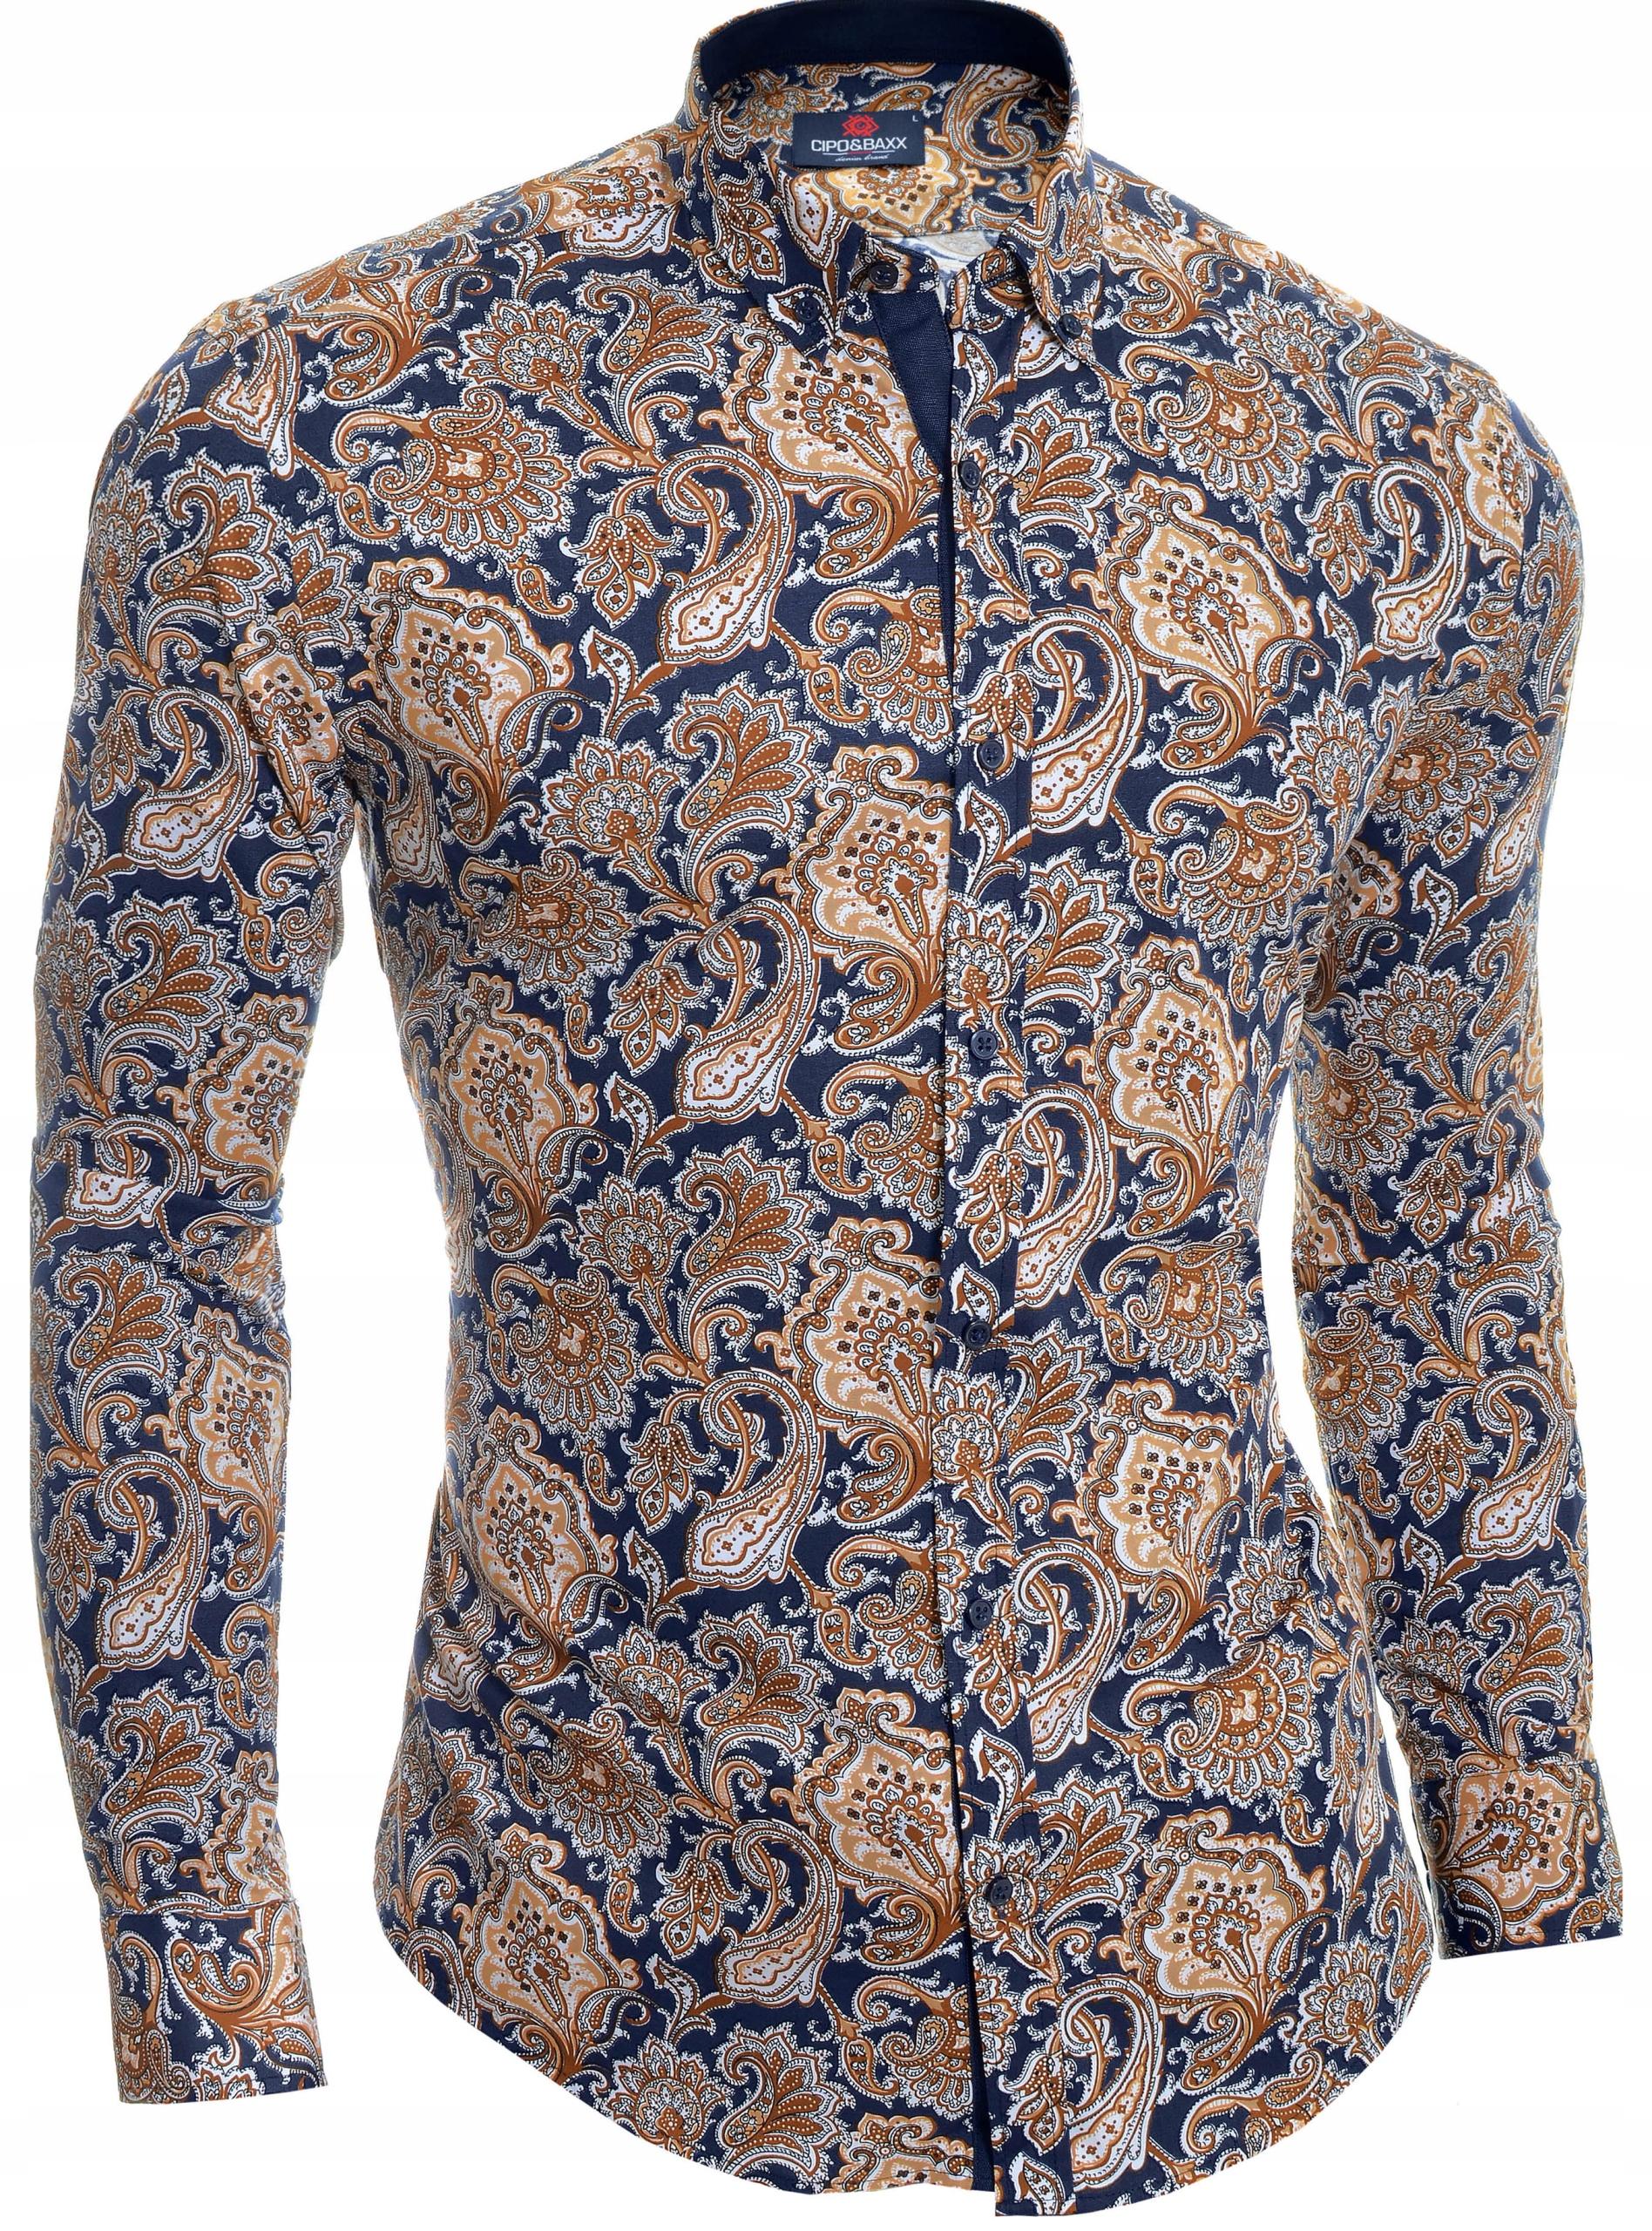 Koszula Męska Cipo Baxx Casual Elegancka NOWOŚĆ 7801908877  pEfn1